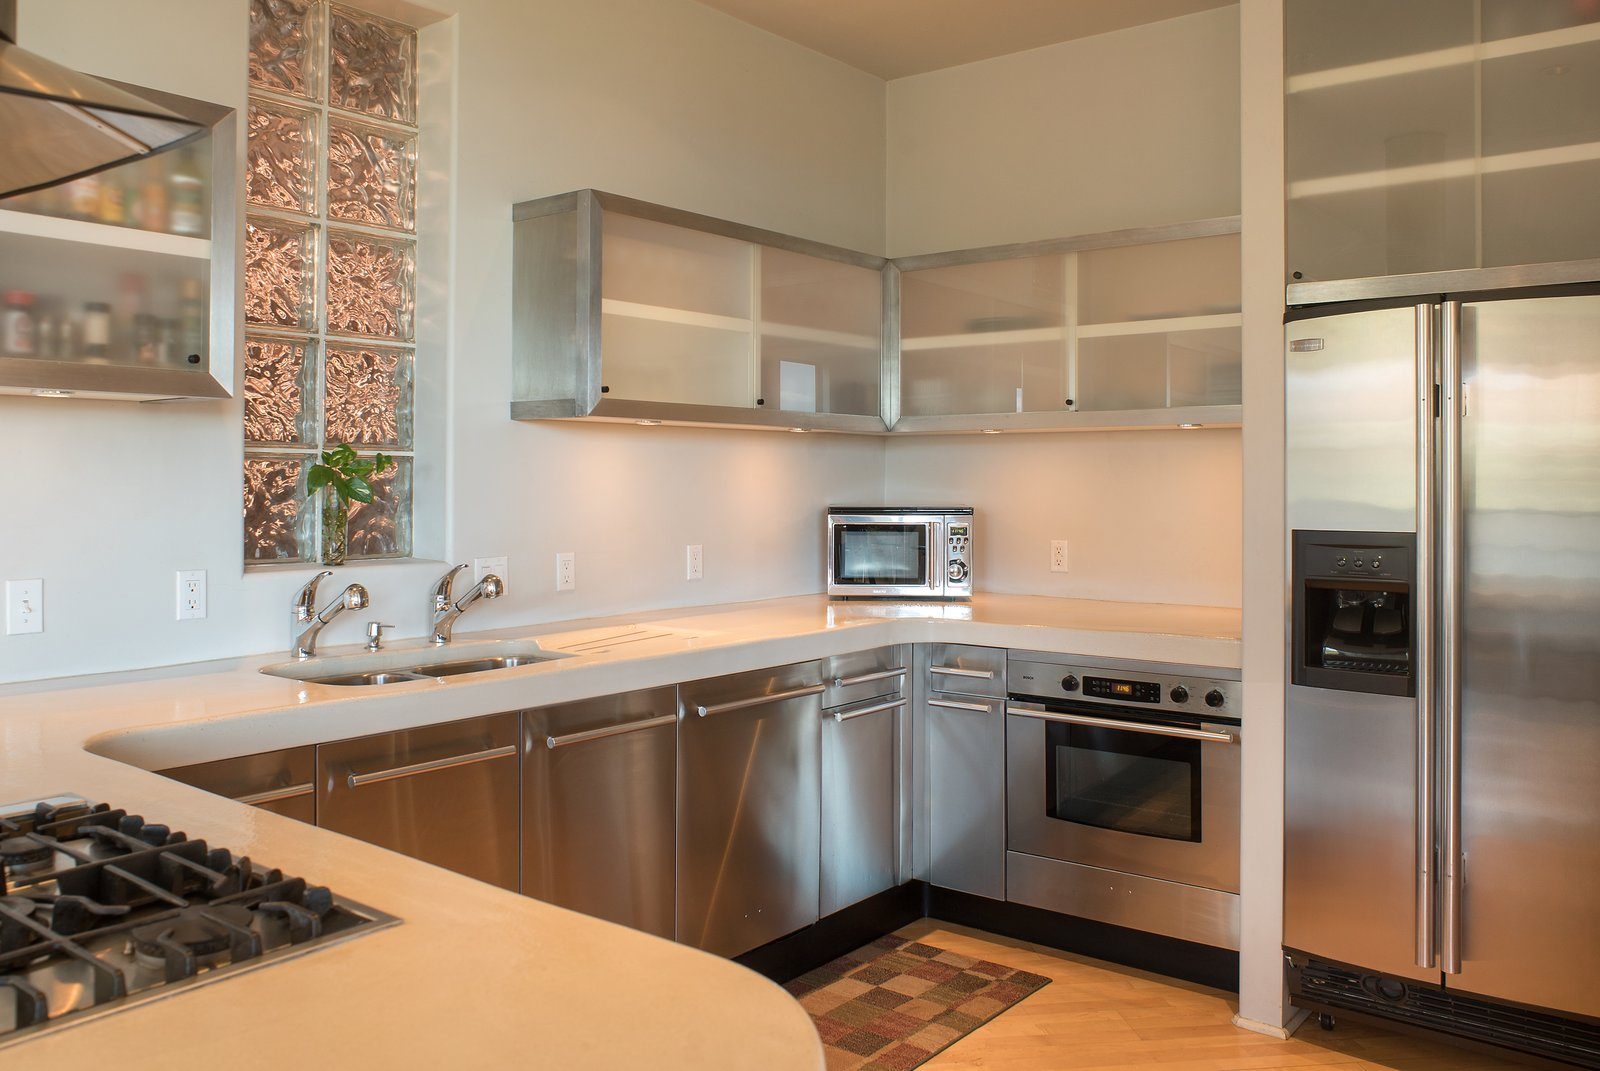 Kitchen, Refrigerator, Cooktops, Microwave, Wall Oven, Light Hardwood Floor, and Drop In Sink  2945 Red Rock Loop Rd.